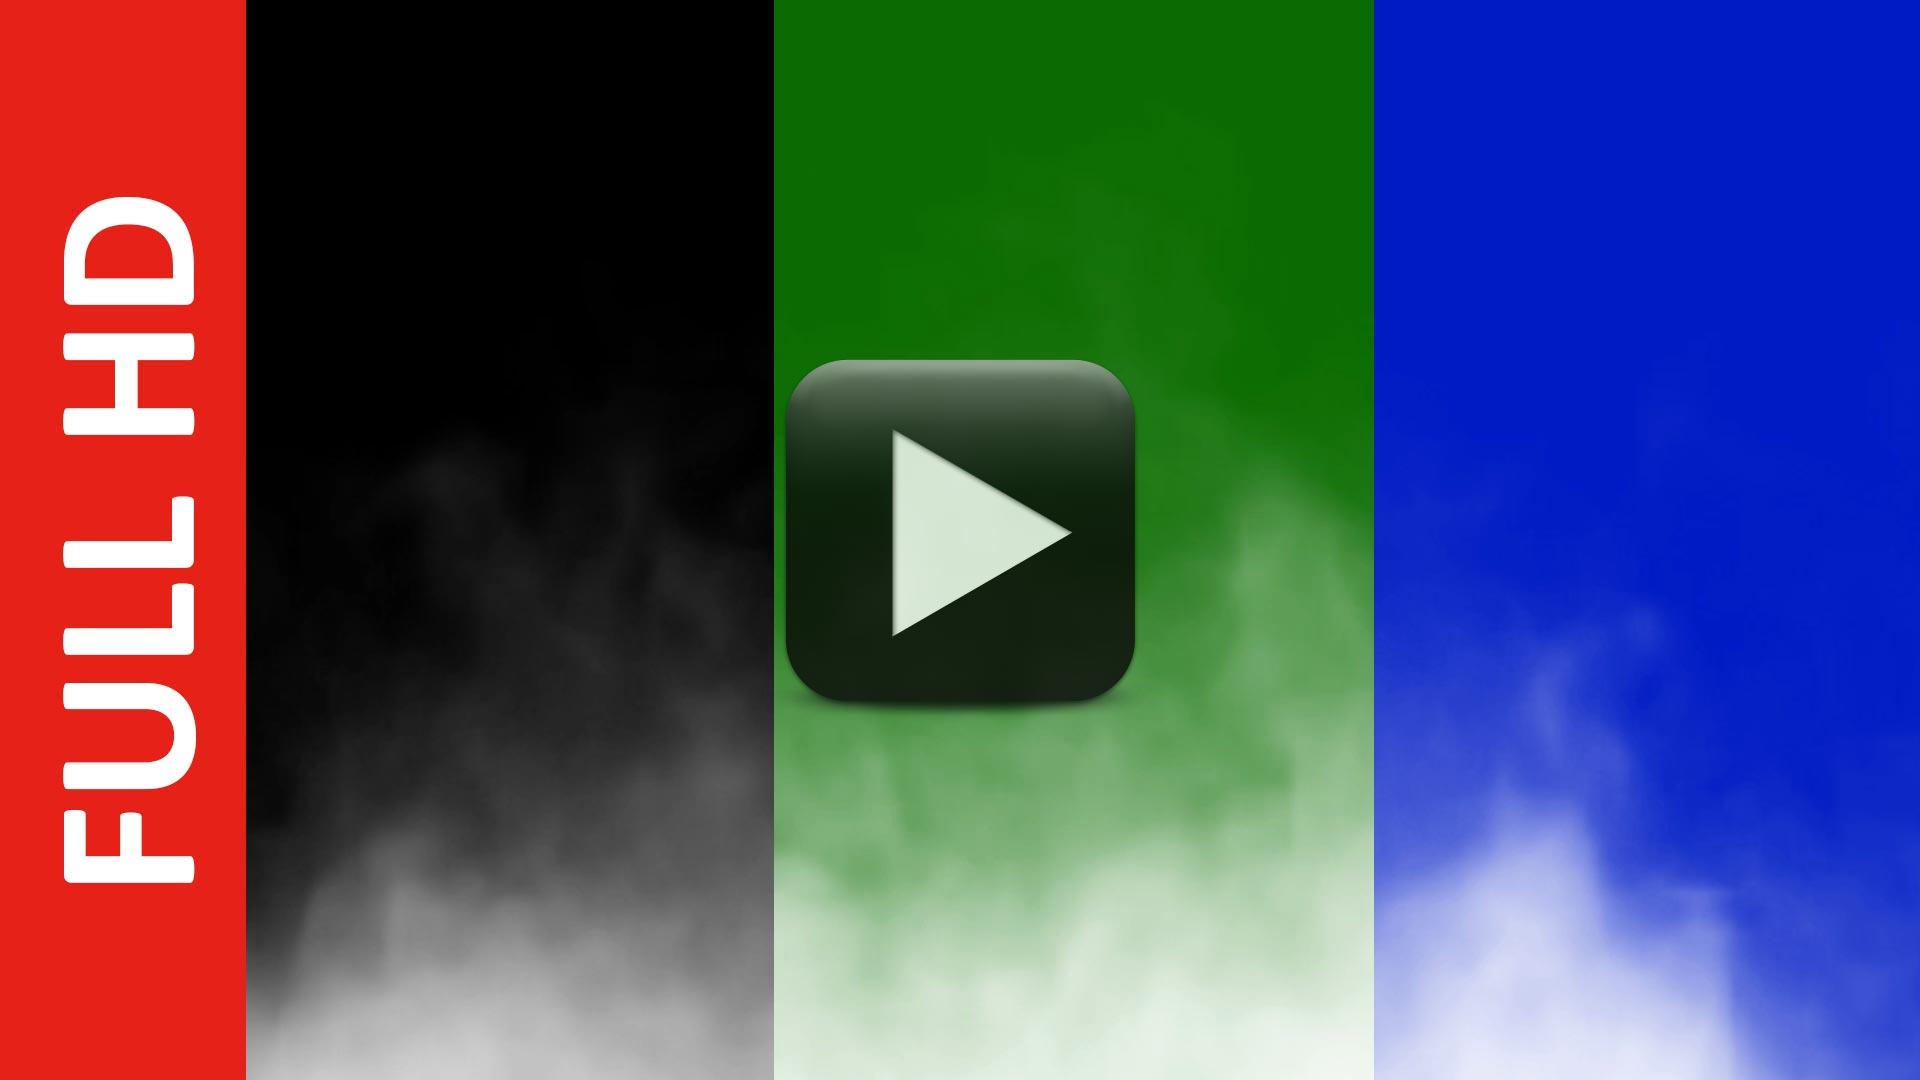 Smoke Black | Green | Blue Screen Effect HD Video Free Download